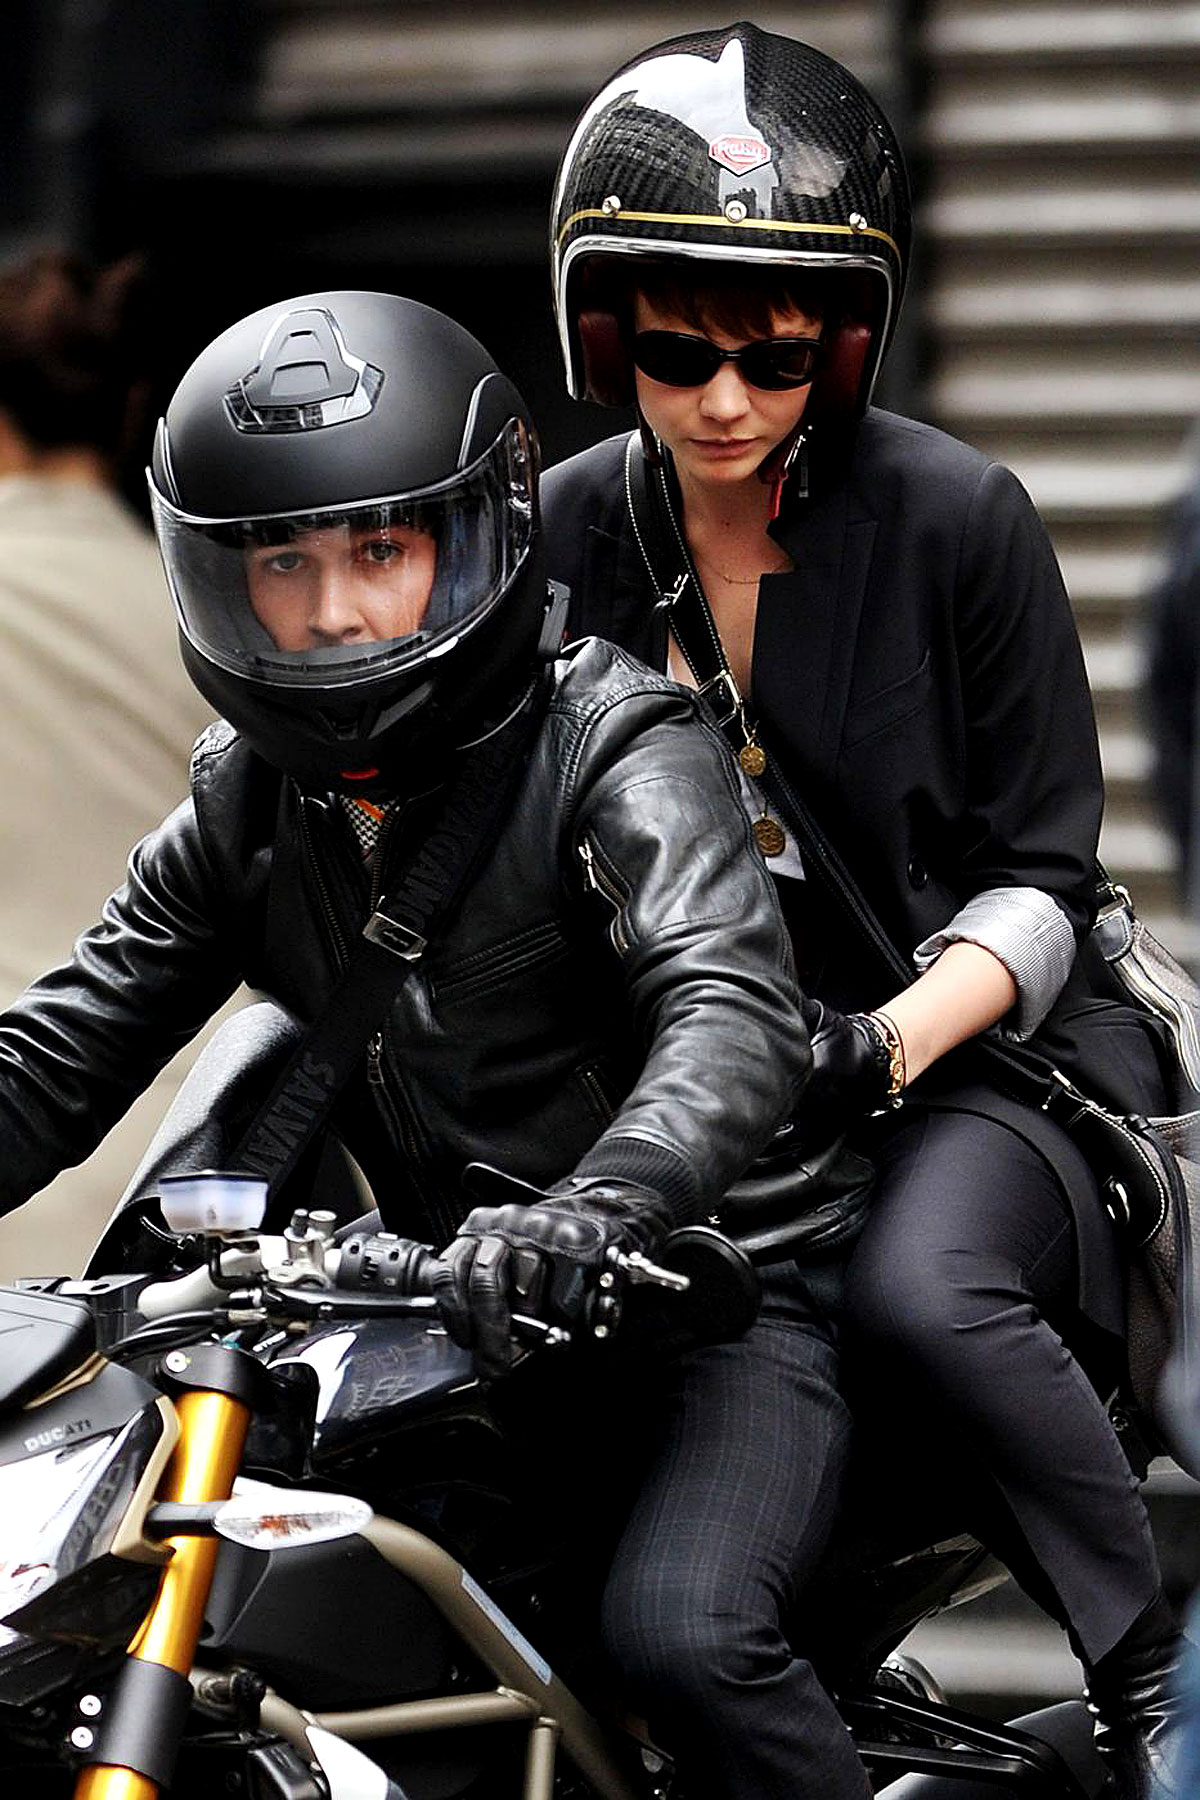 PHOTO GALLERY: Shia & Carey Film 'Wall Street'